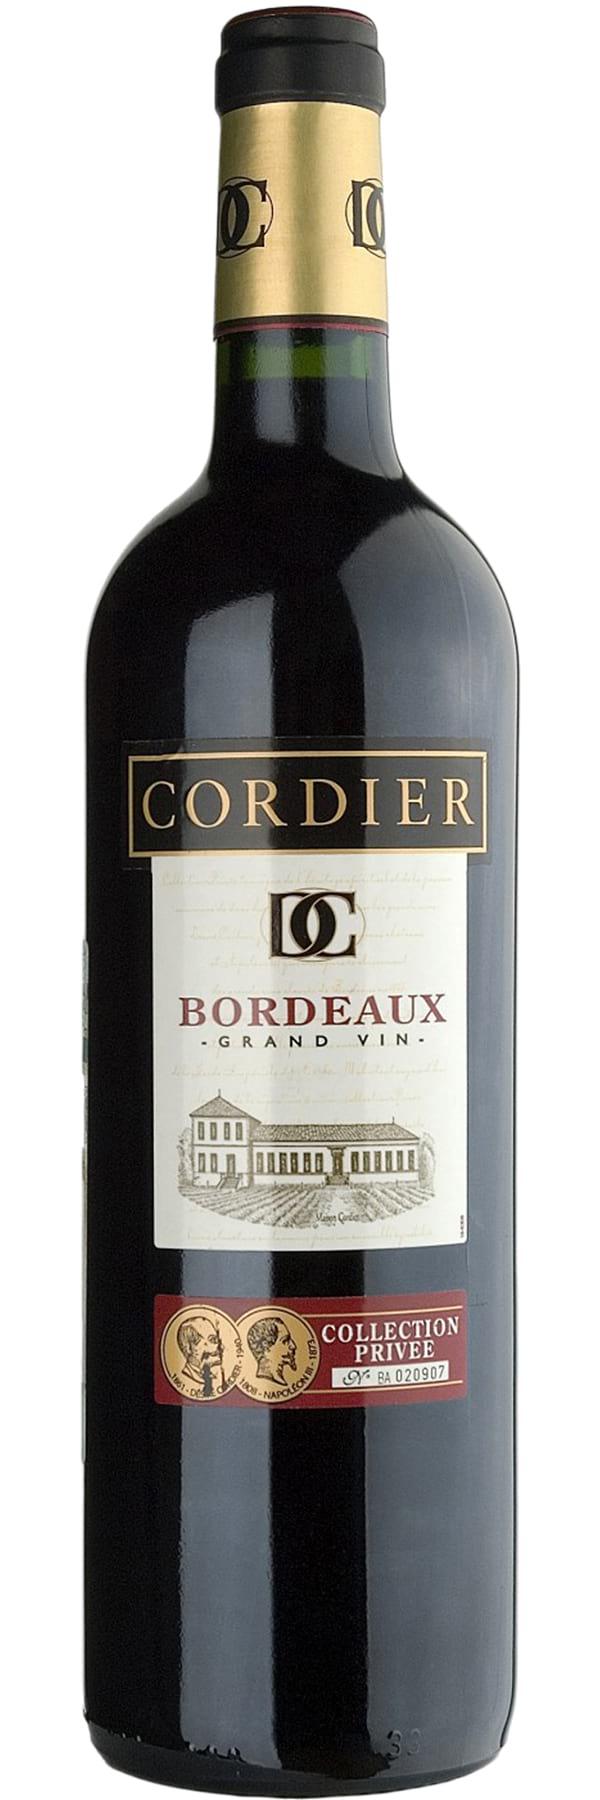 2007 Cordier «Collection Privee» Bordeaux фото